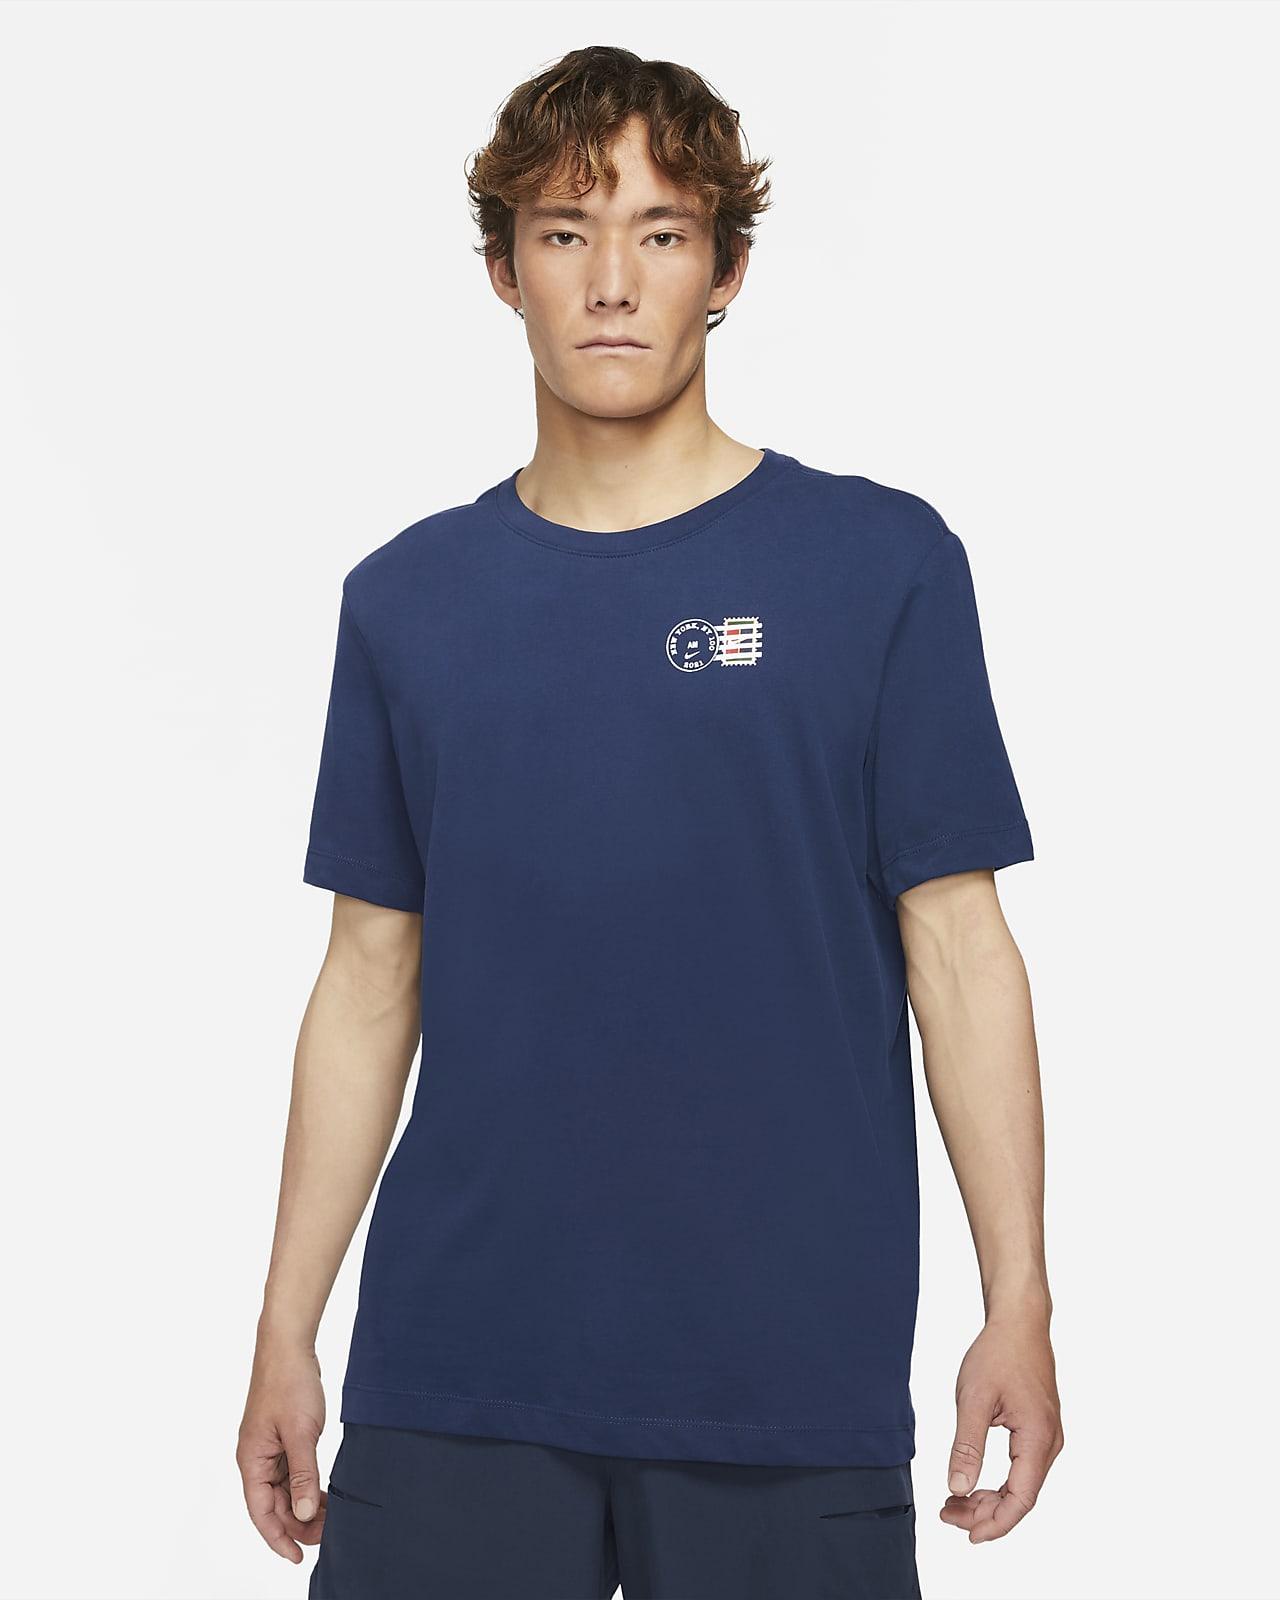 NikeCourt Dri-FIT Men's Tennis T-Shirt